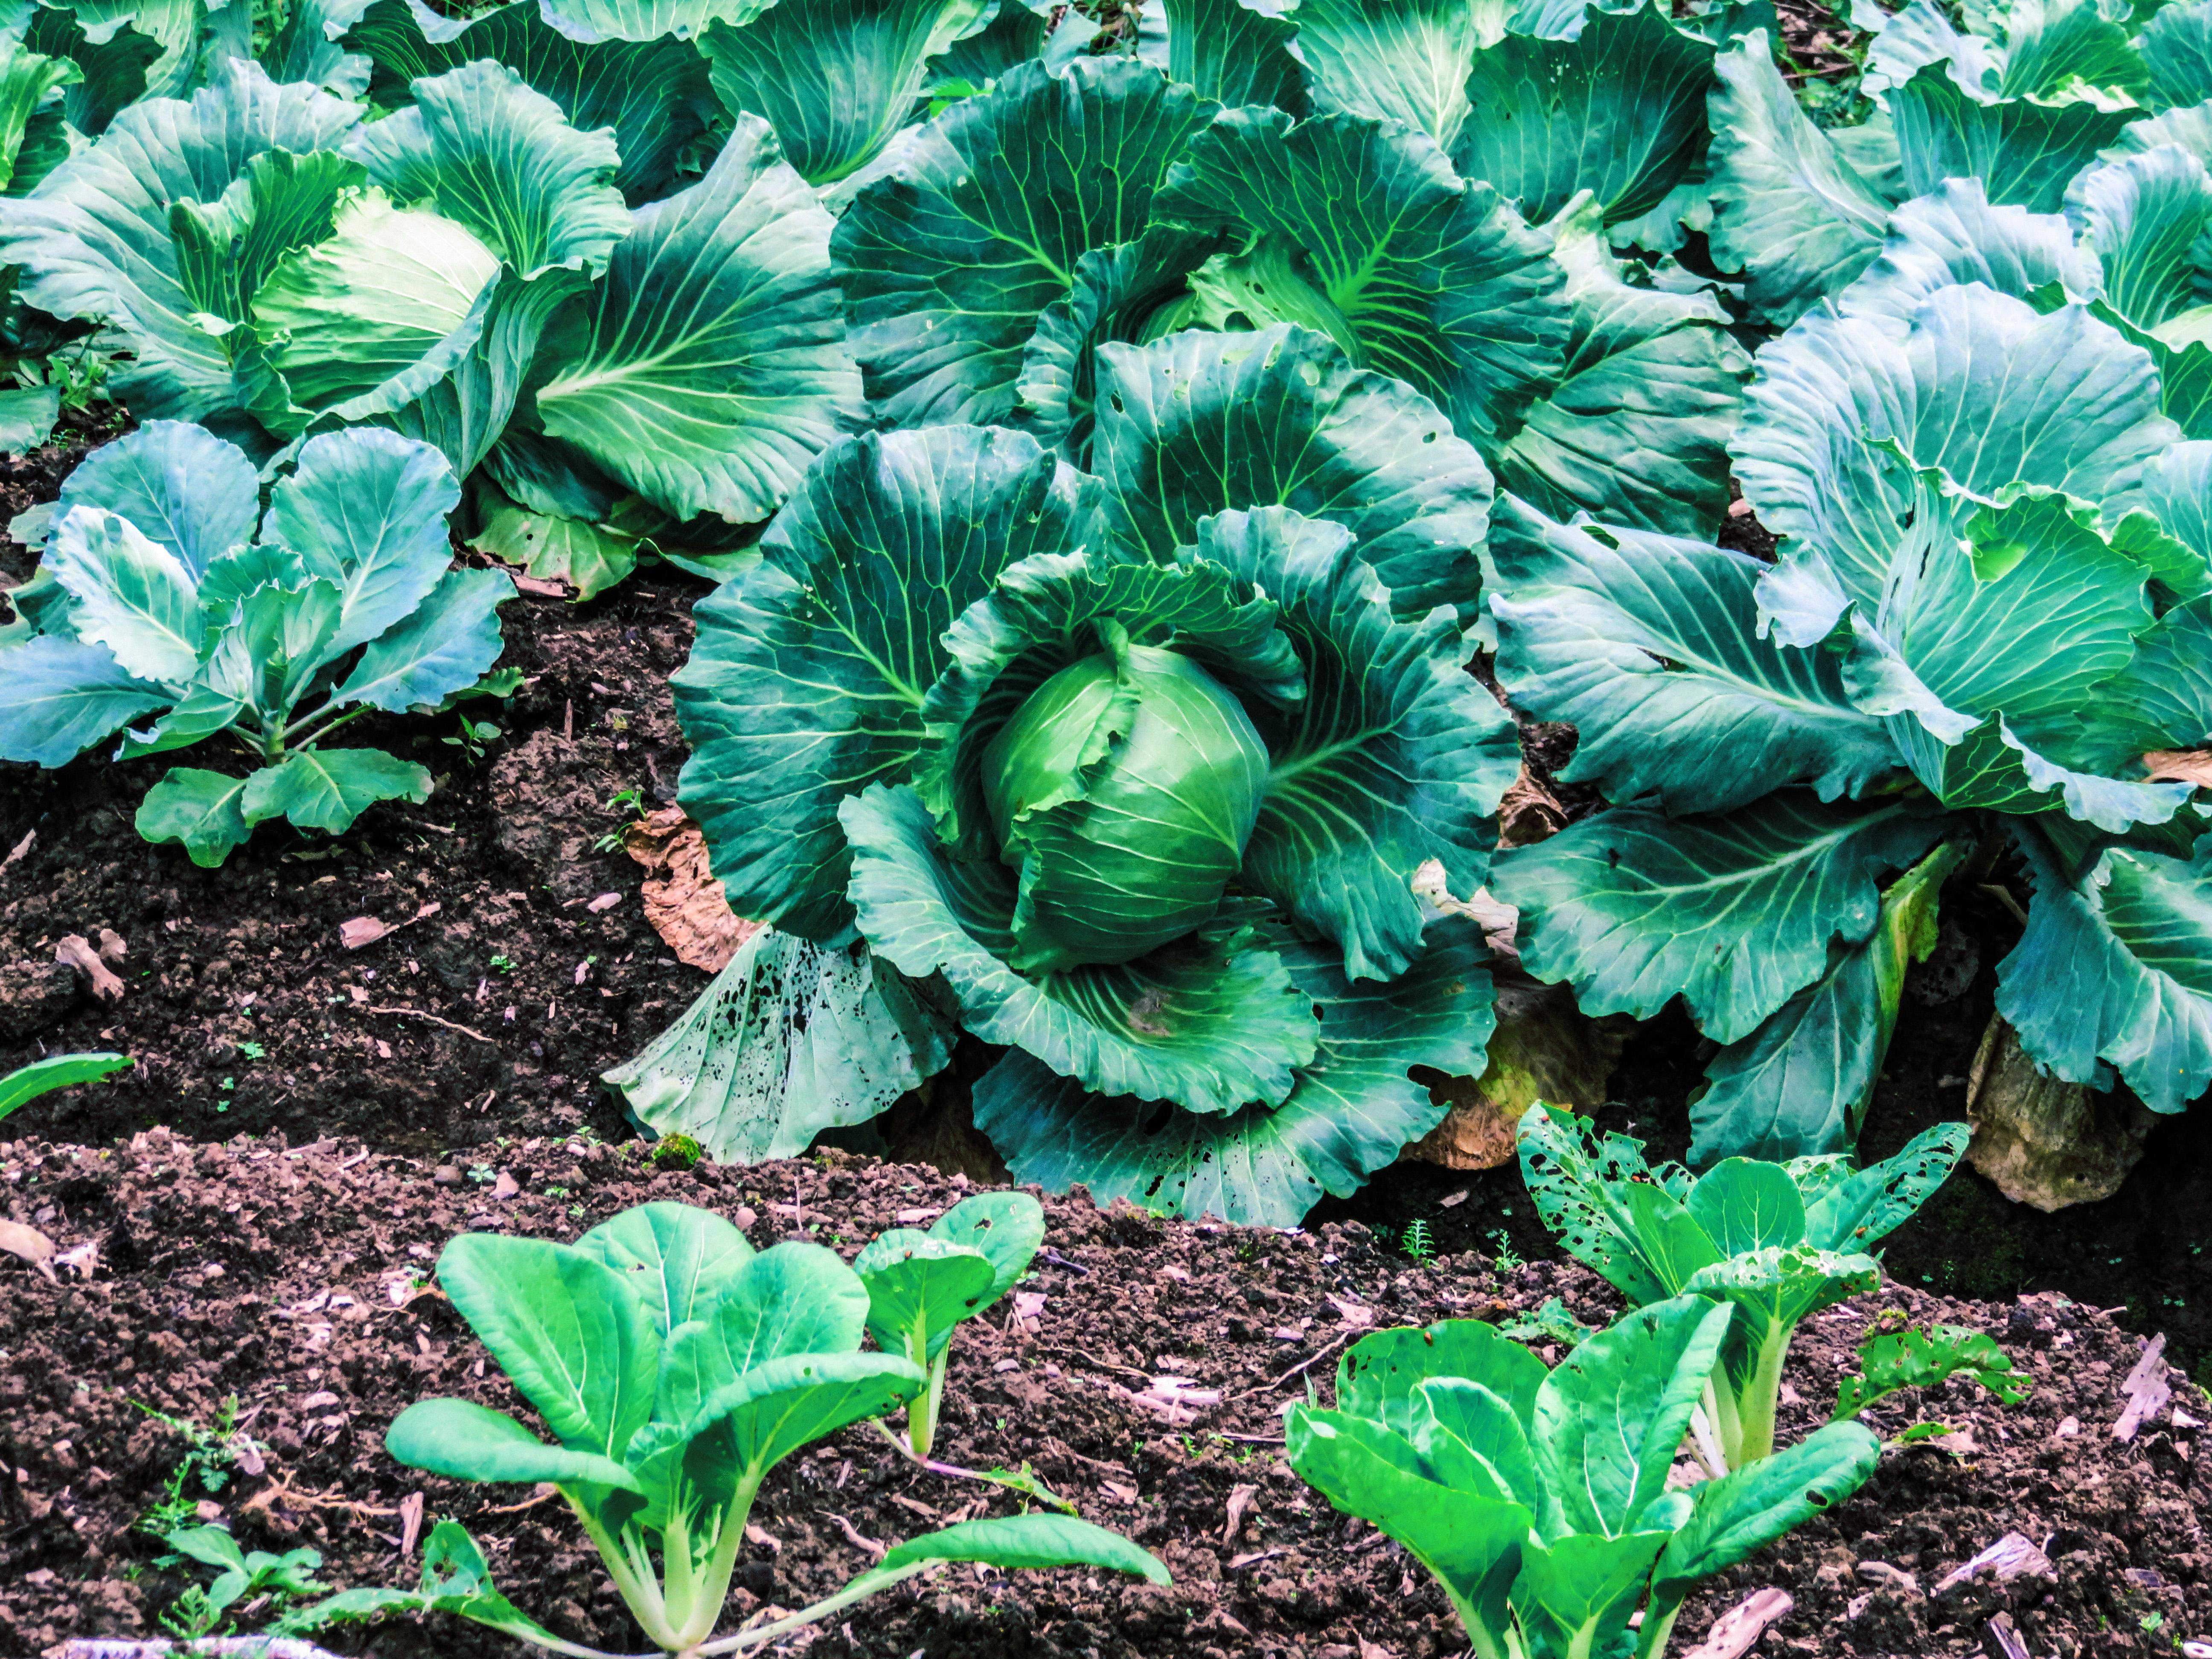 Misima cabbage plots by Jerad_edited2